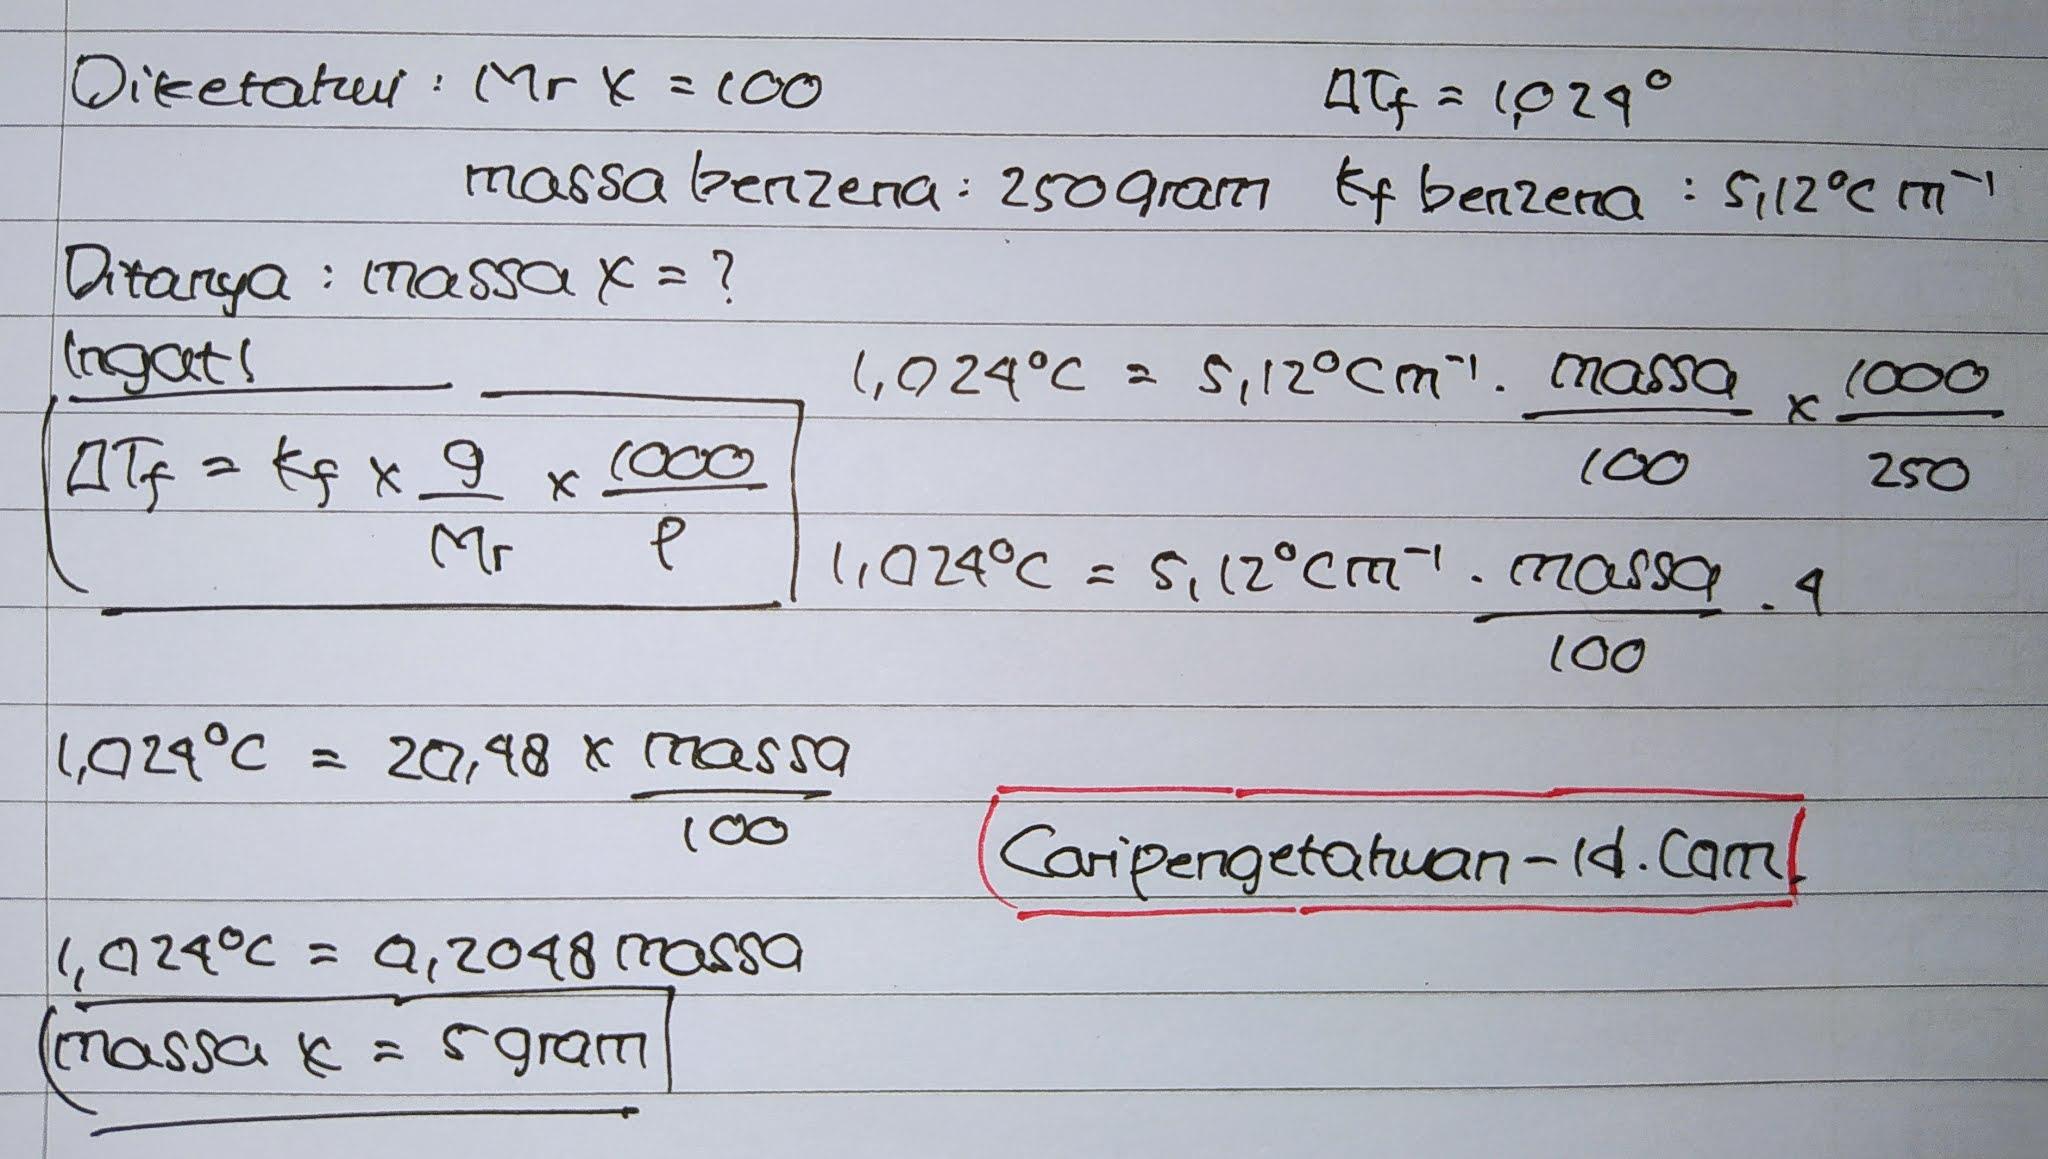 Senyawa X (Mr = 100) yang tidak dapat menghantarkan listrik dilarutkan dalam 250 gram benzena, ternyata memberikan penurunan titik beku (ΔTf) sebesar 1,024°C Jika diketahui harga Kf benzena = 5,12°C m-1 maka berat senyawa yang dilarutkan adalah ….